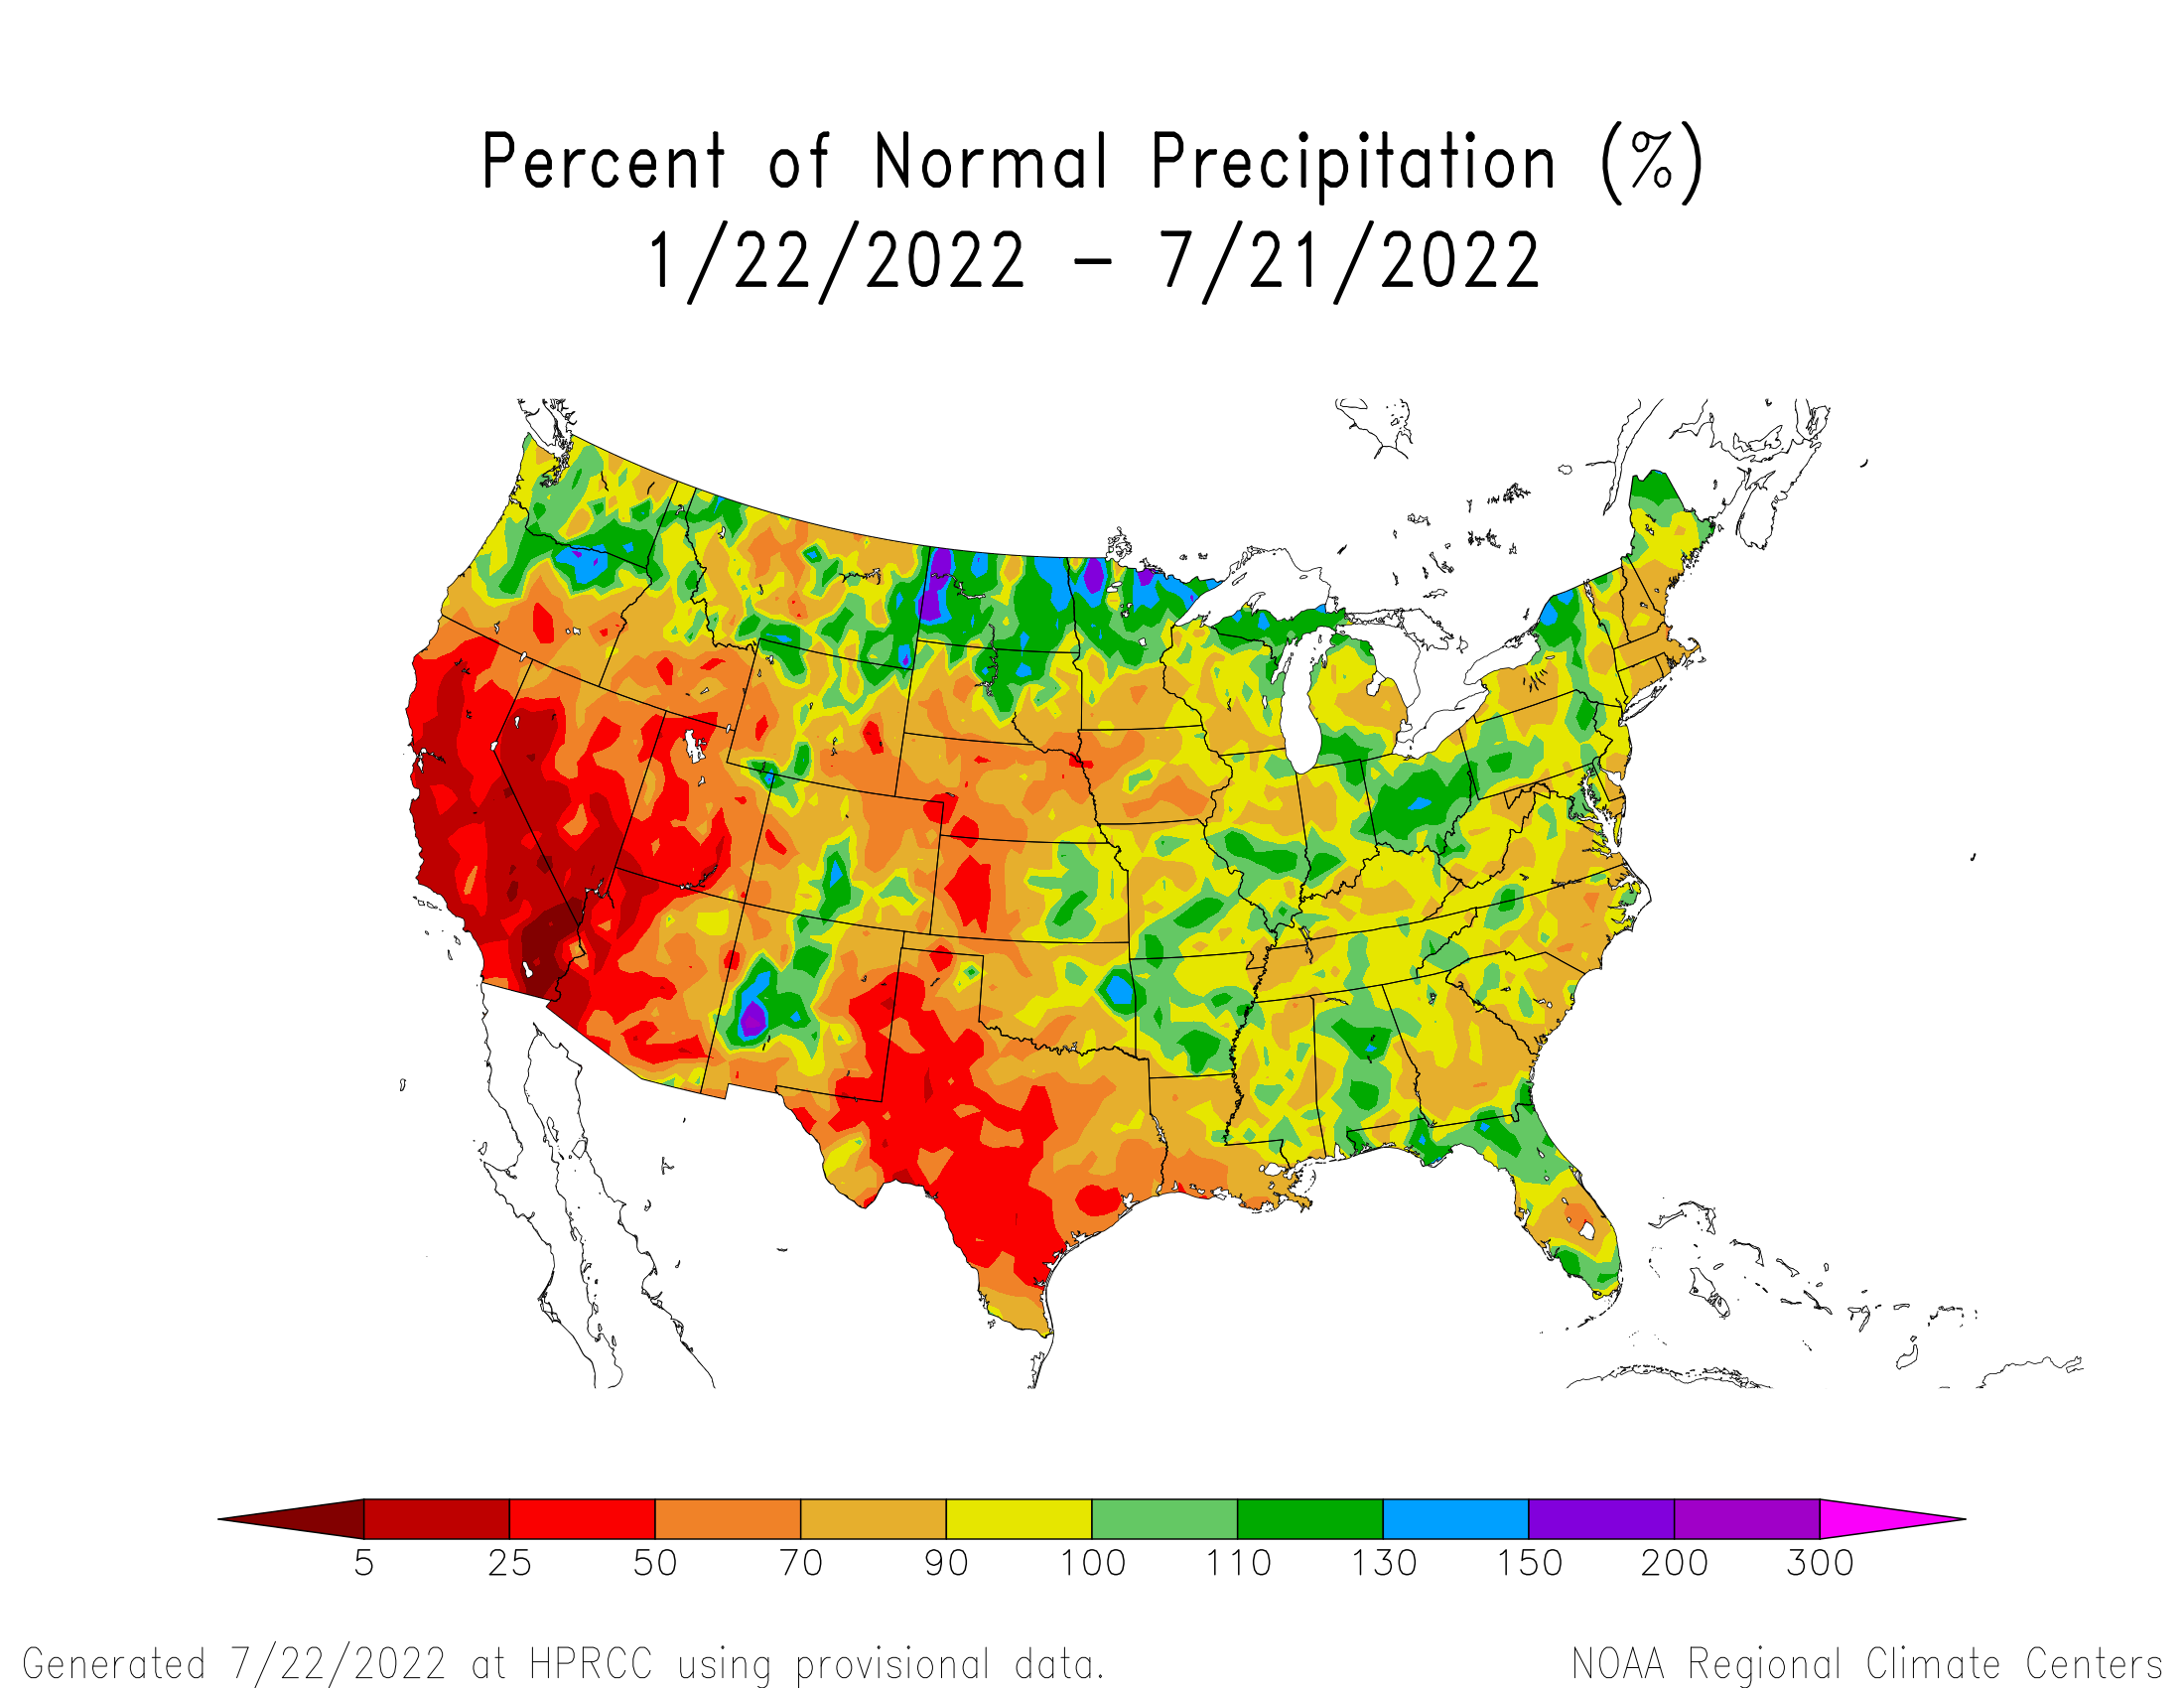 6-month Precipitation Percent of Normal